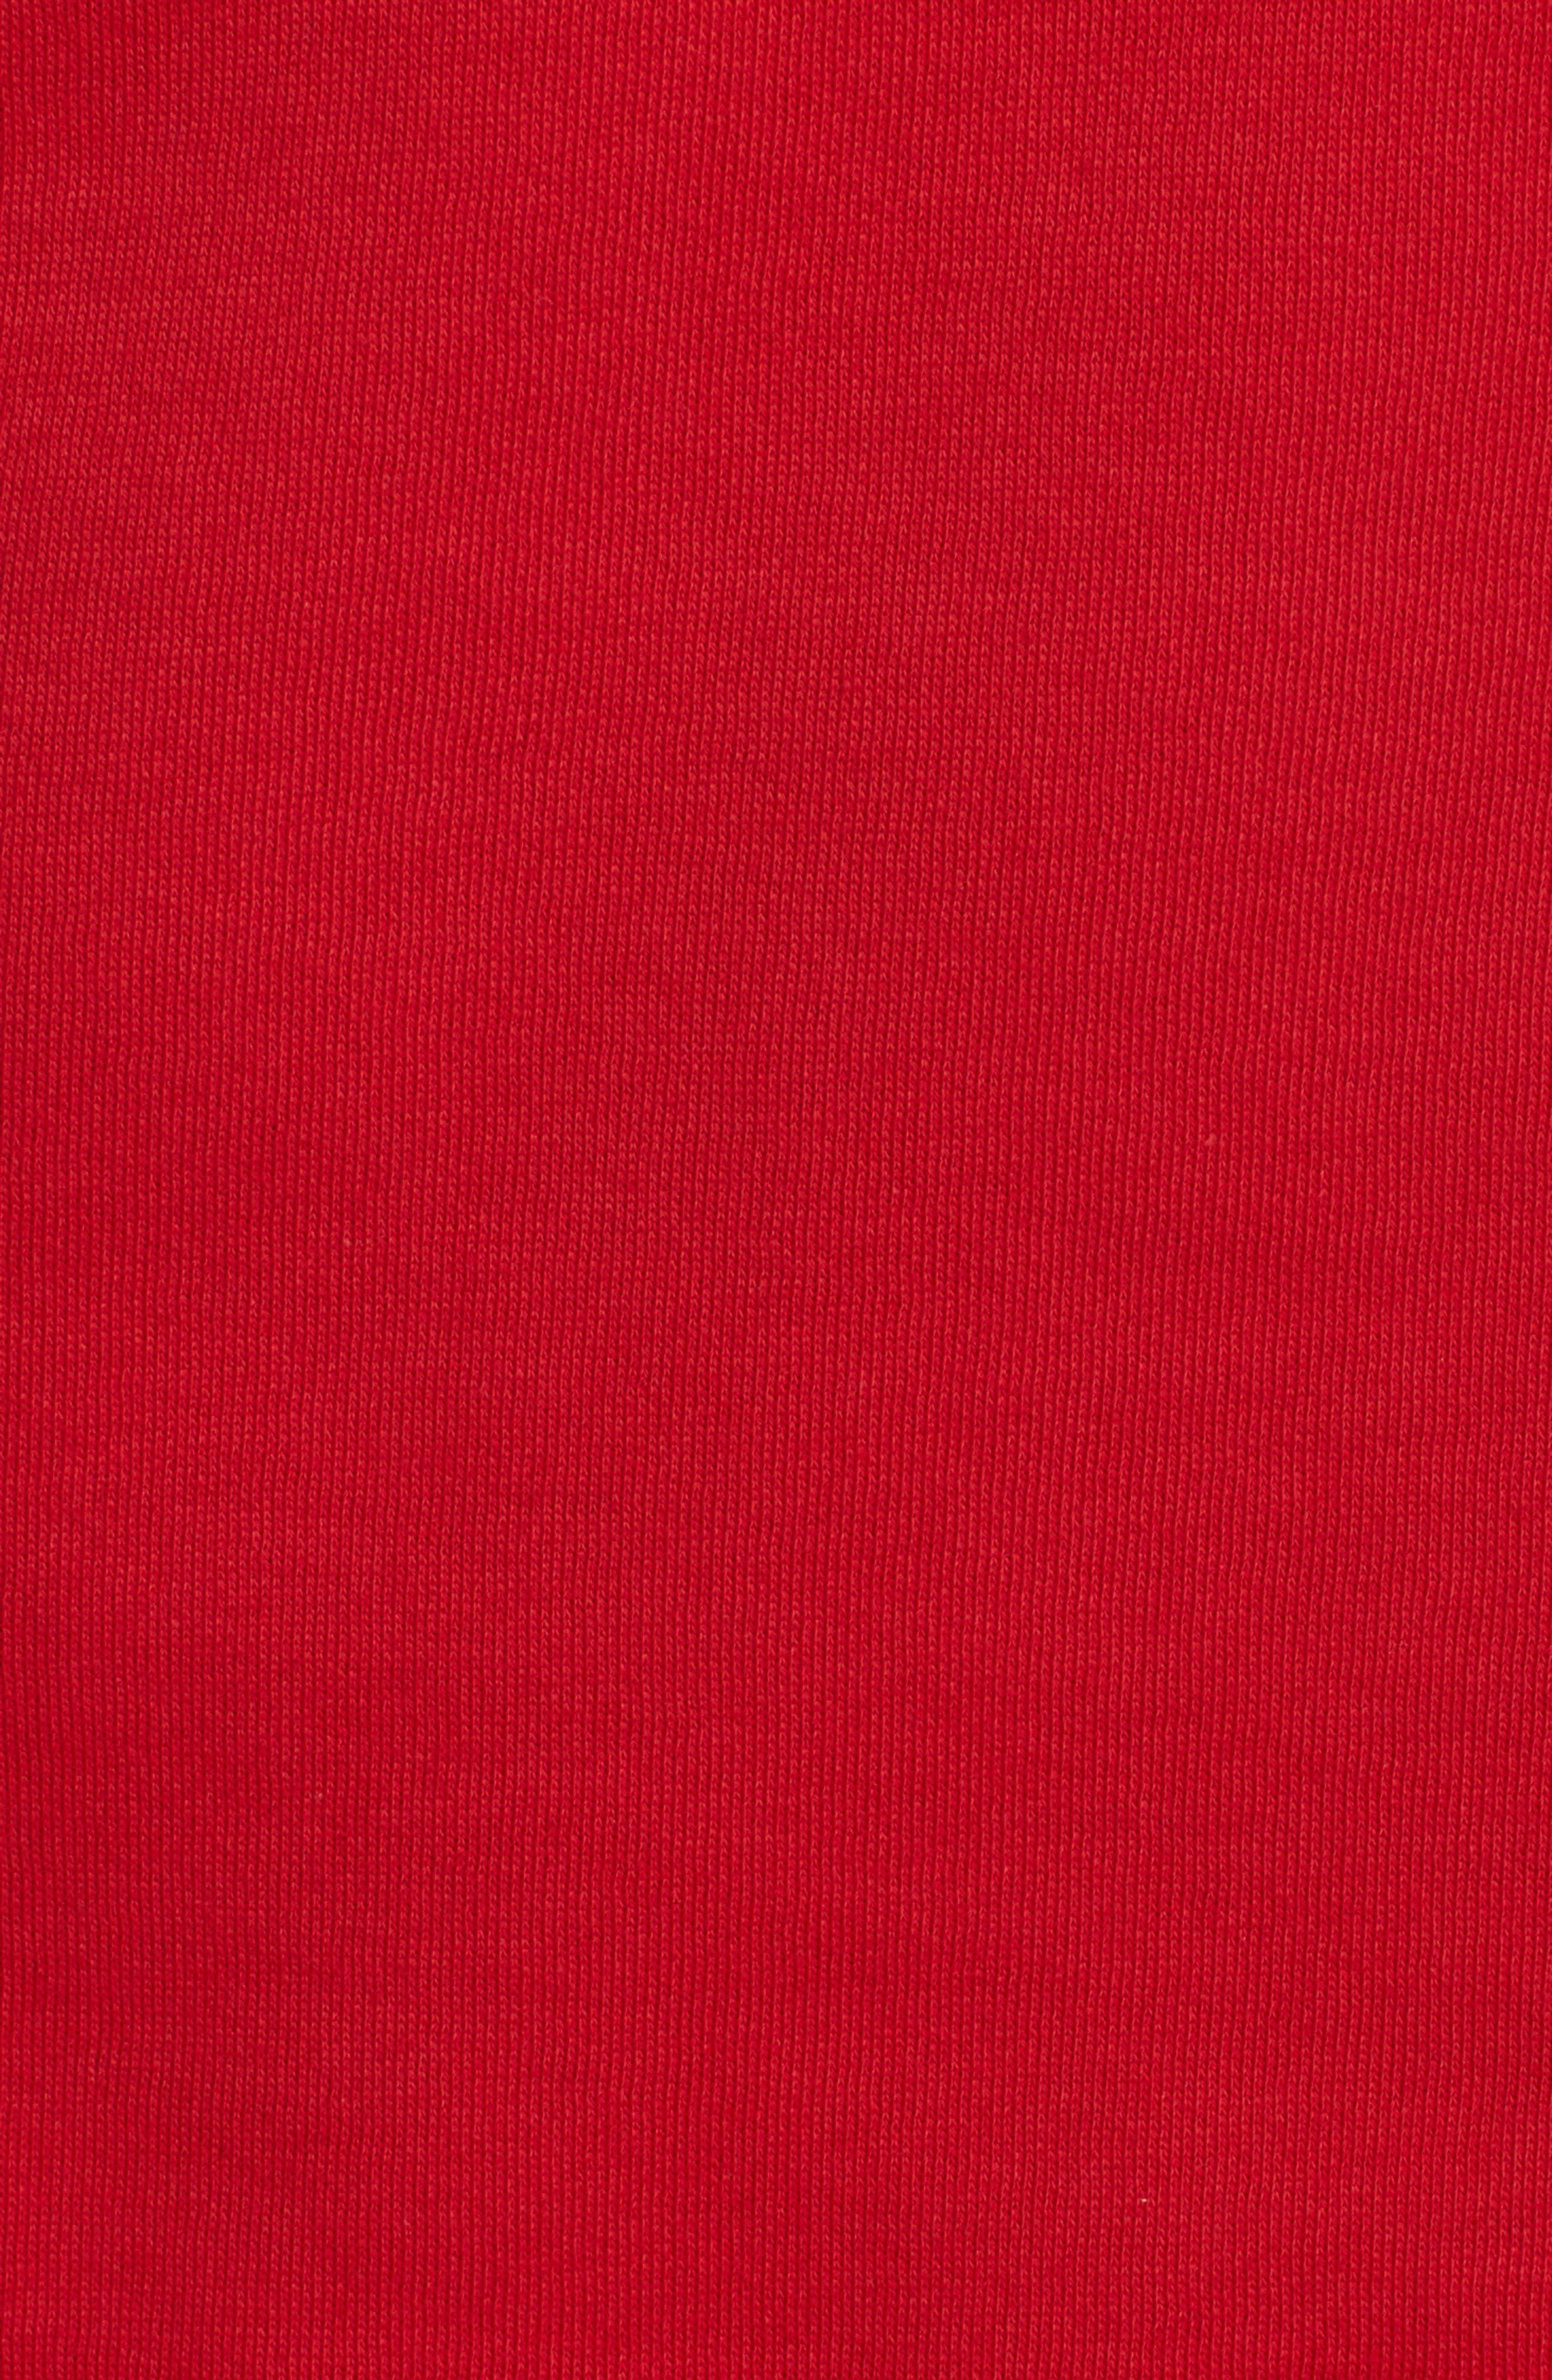 Logo Sweatshirt Tee,                             Alternate thumbnail 5, color,                             Torch Red